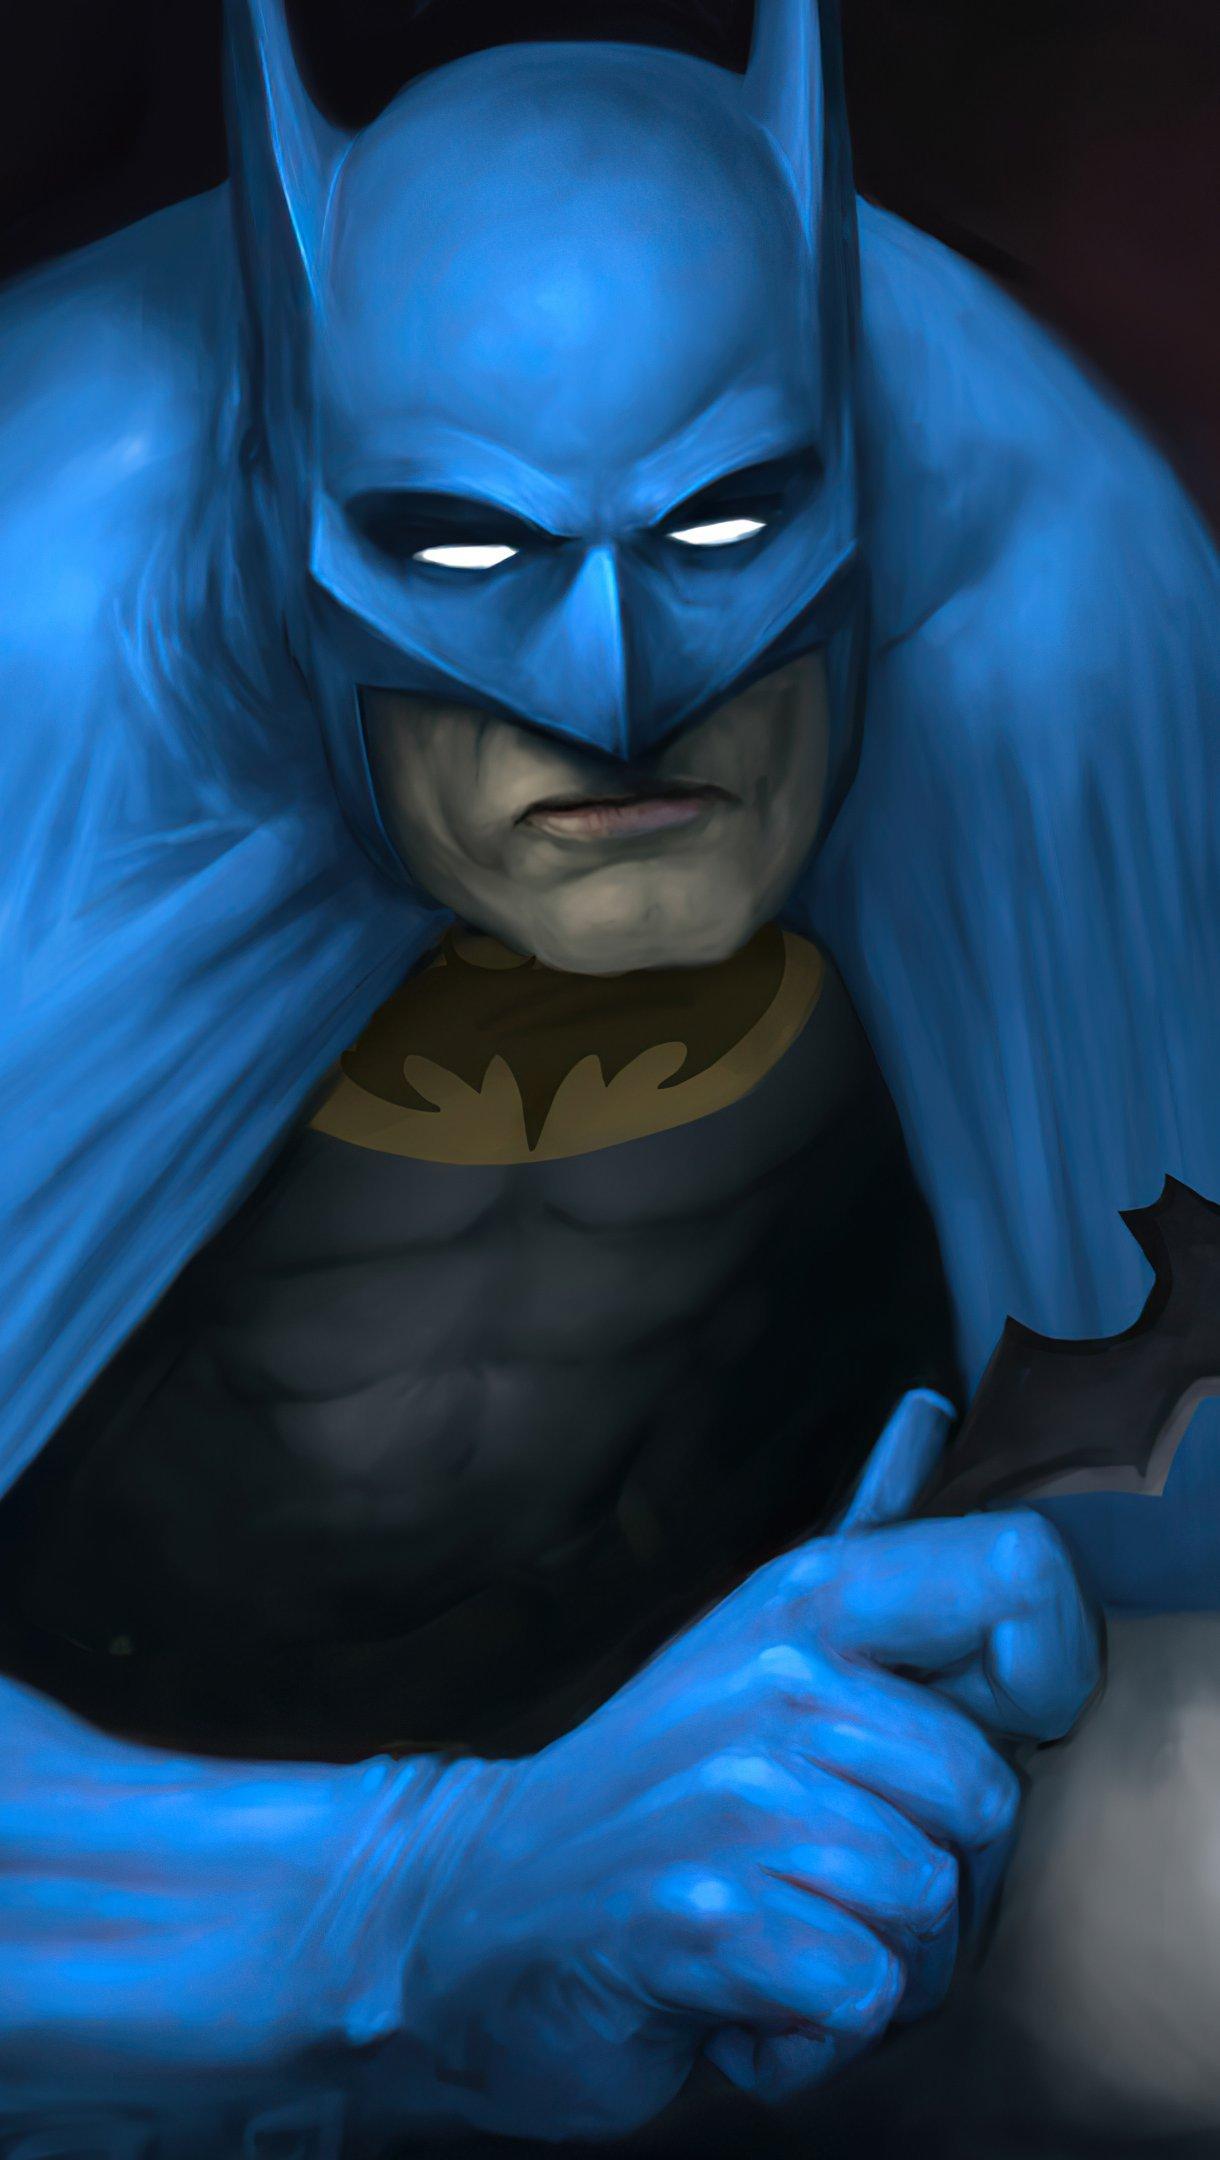 Wallpaper Batman with old suit Vertical